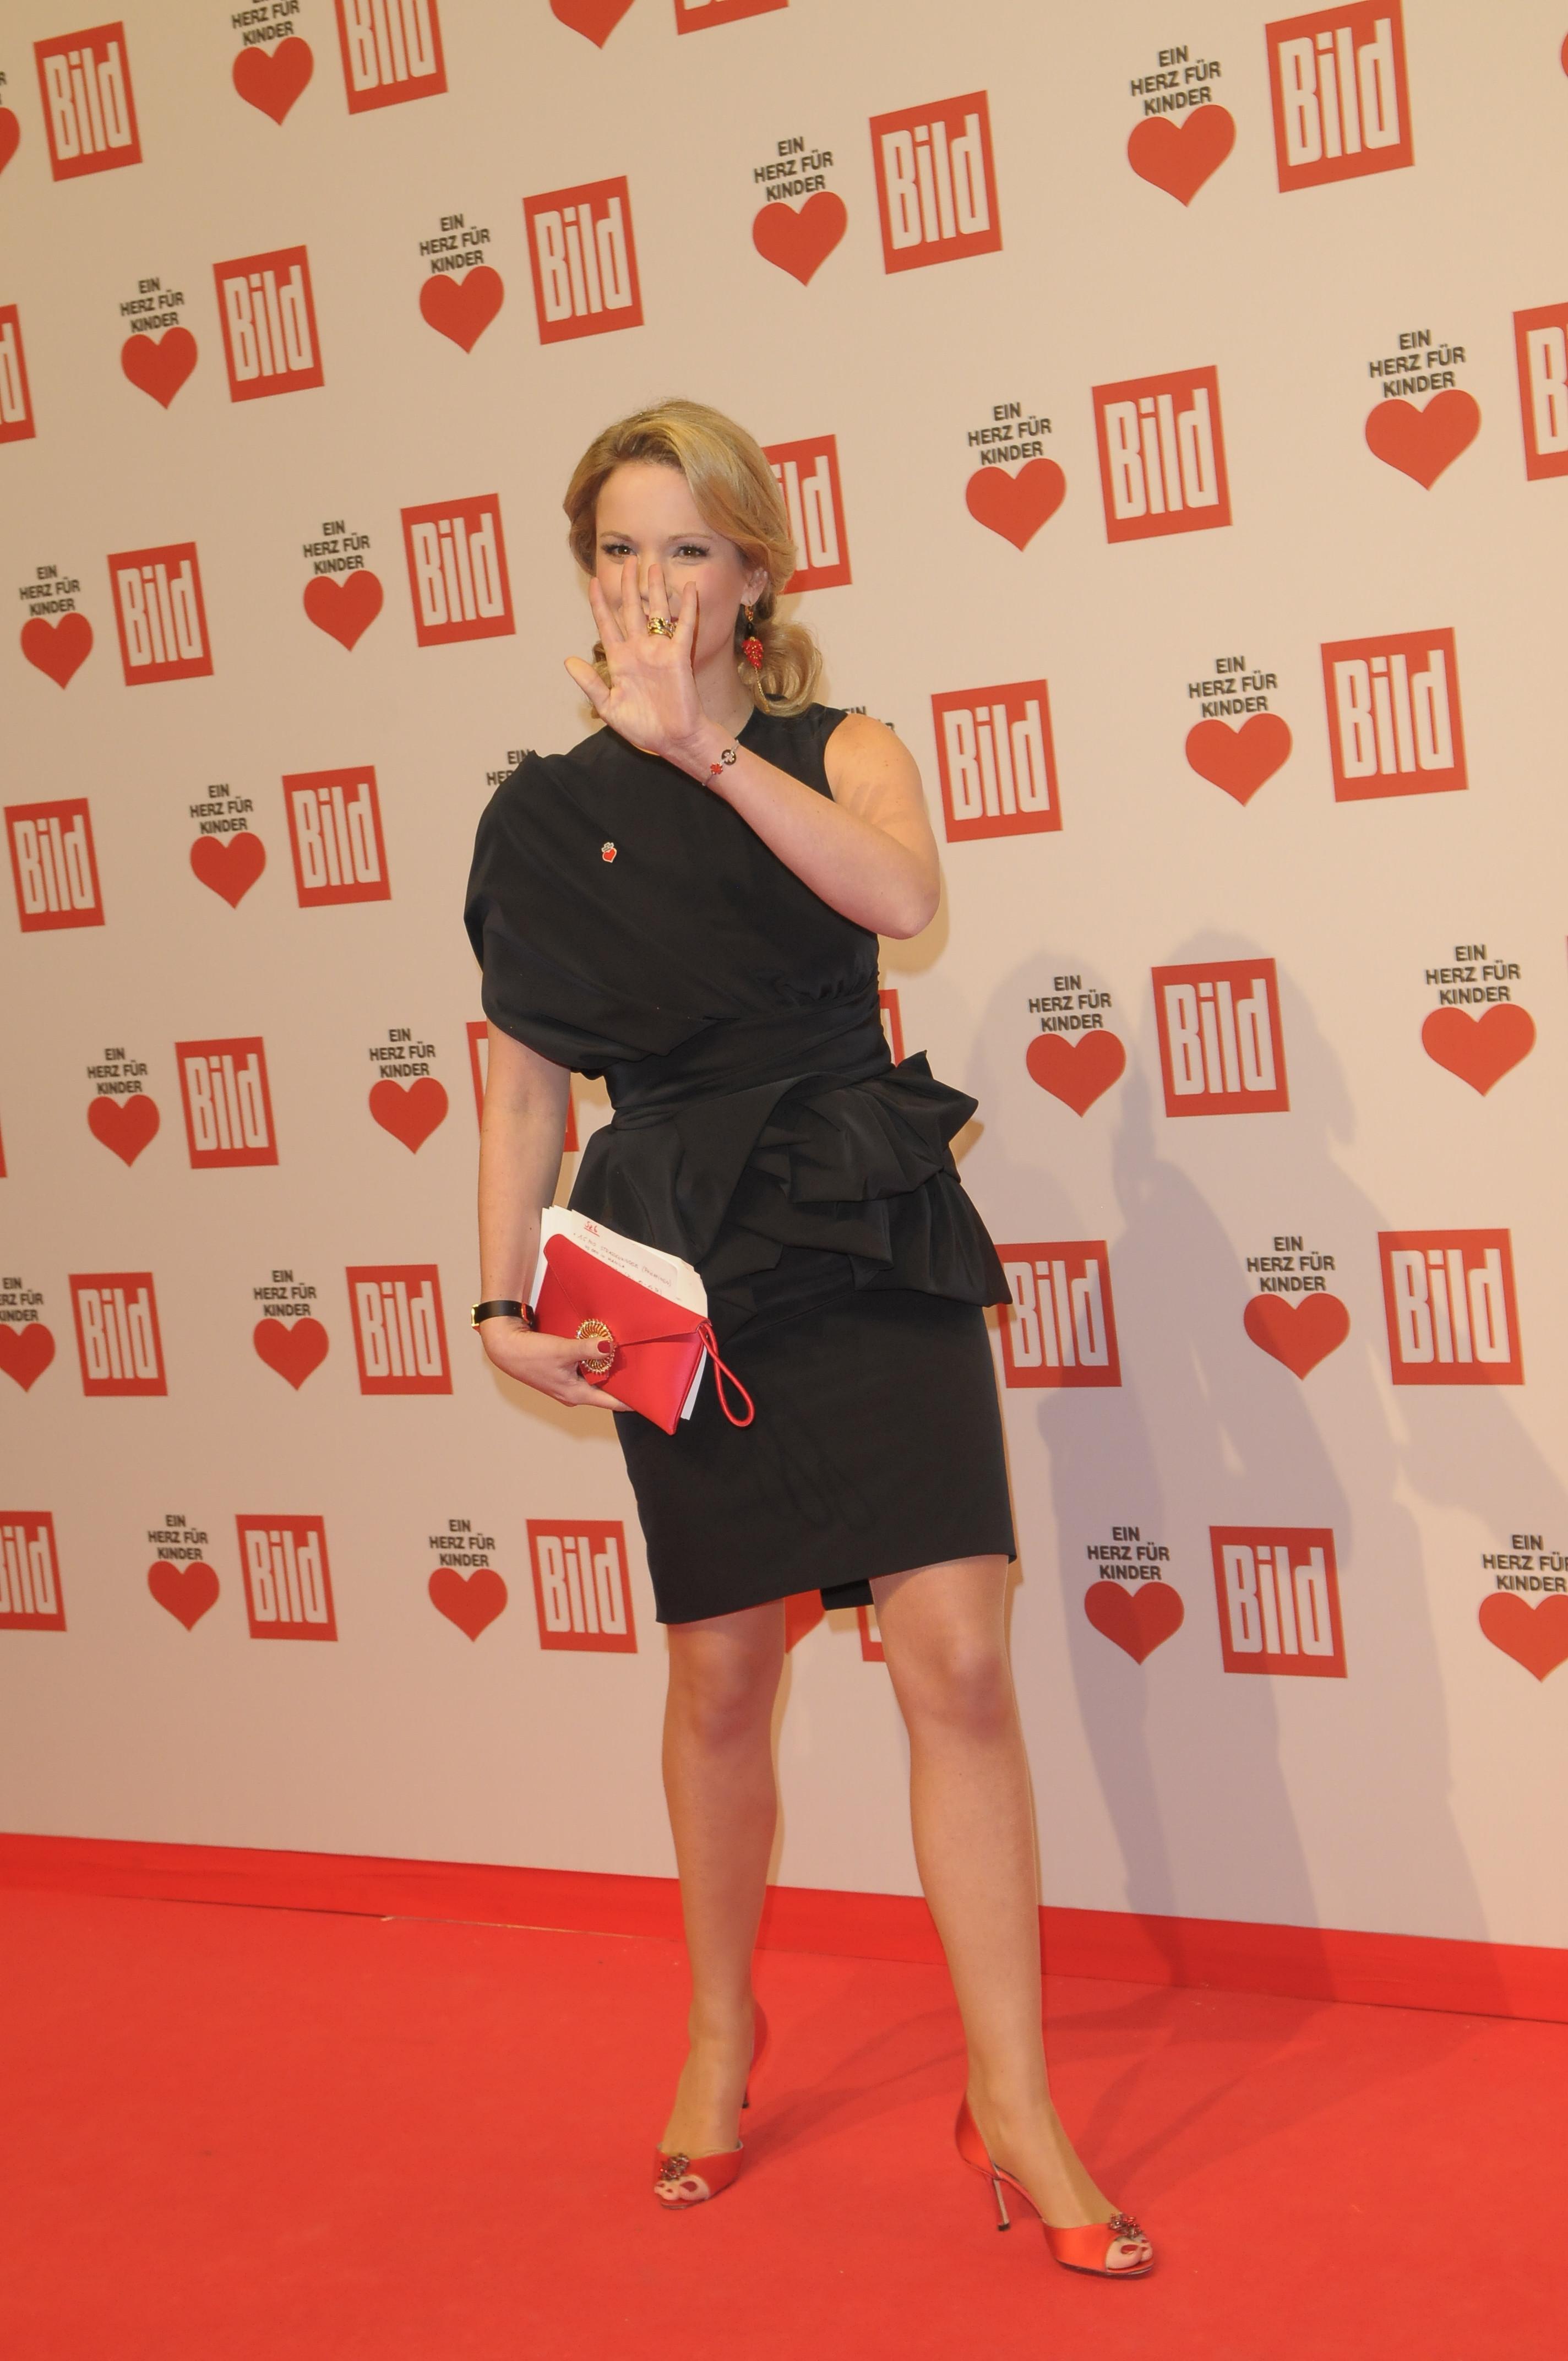 Imdb Gwen Stefani >> Stephanie zu Guttenberg's Feet